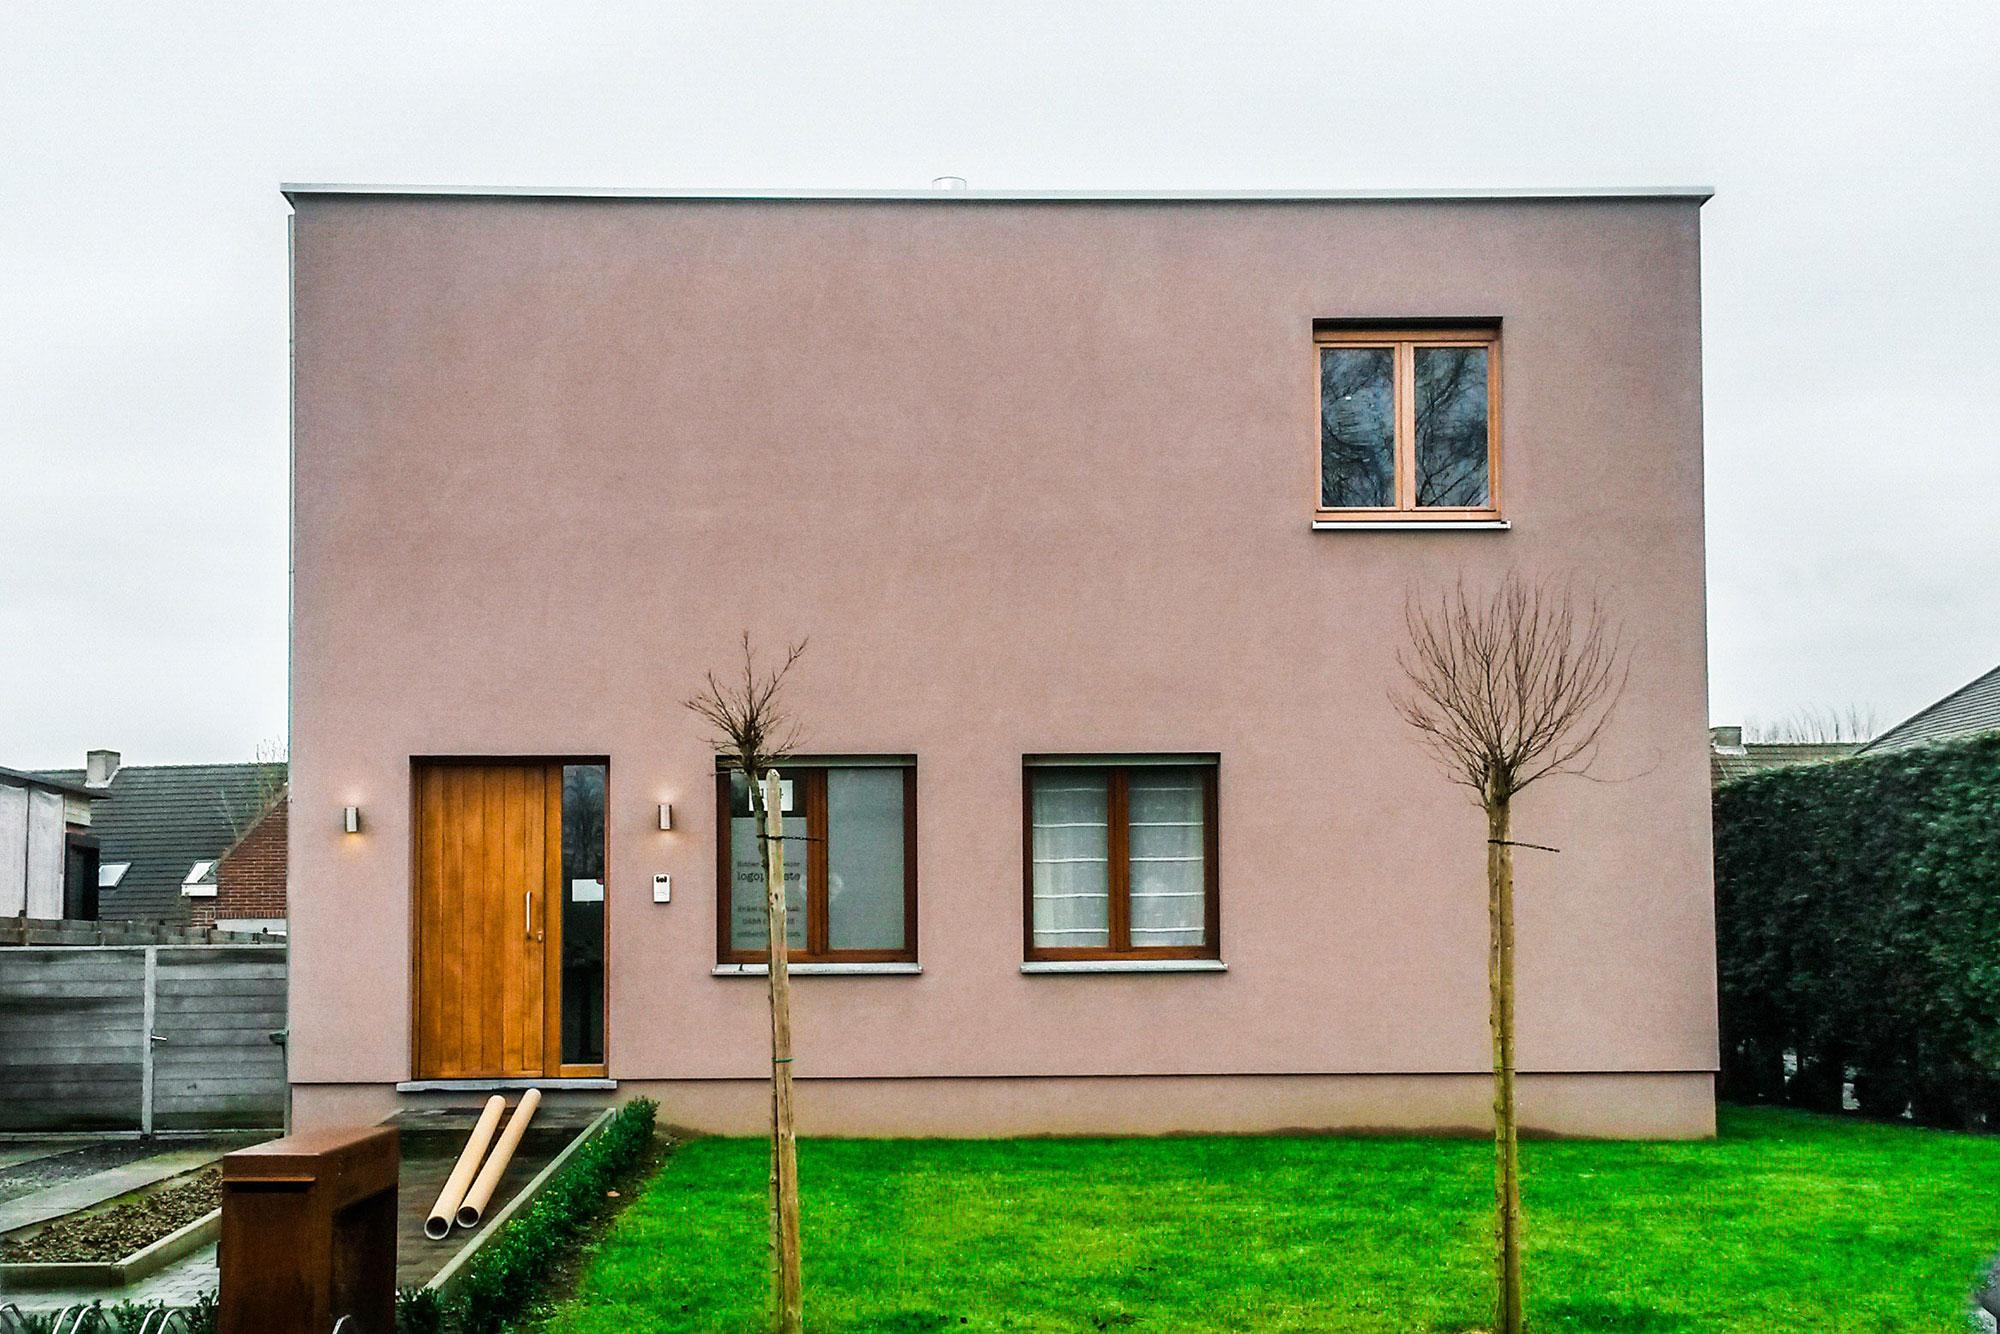 Extra verdieping in houtskeletbouw te Sint-Amandsberg